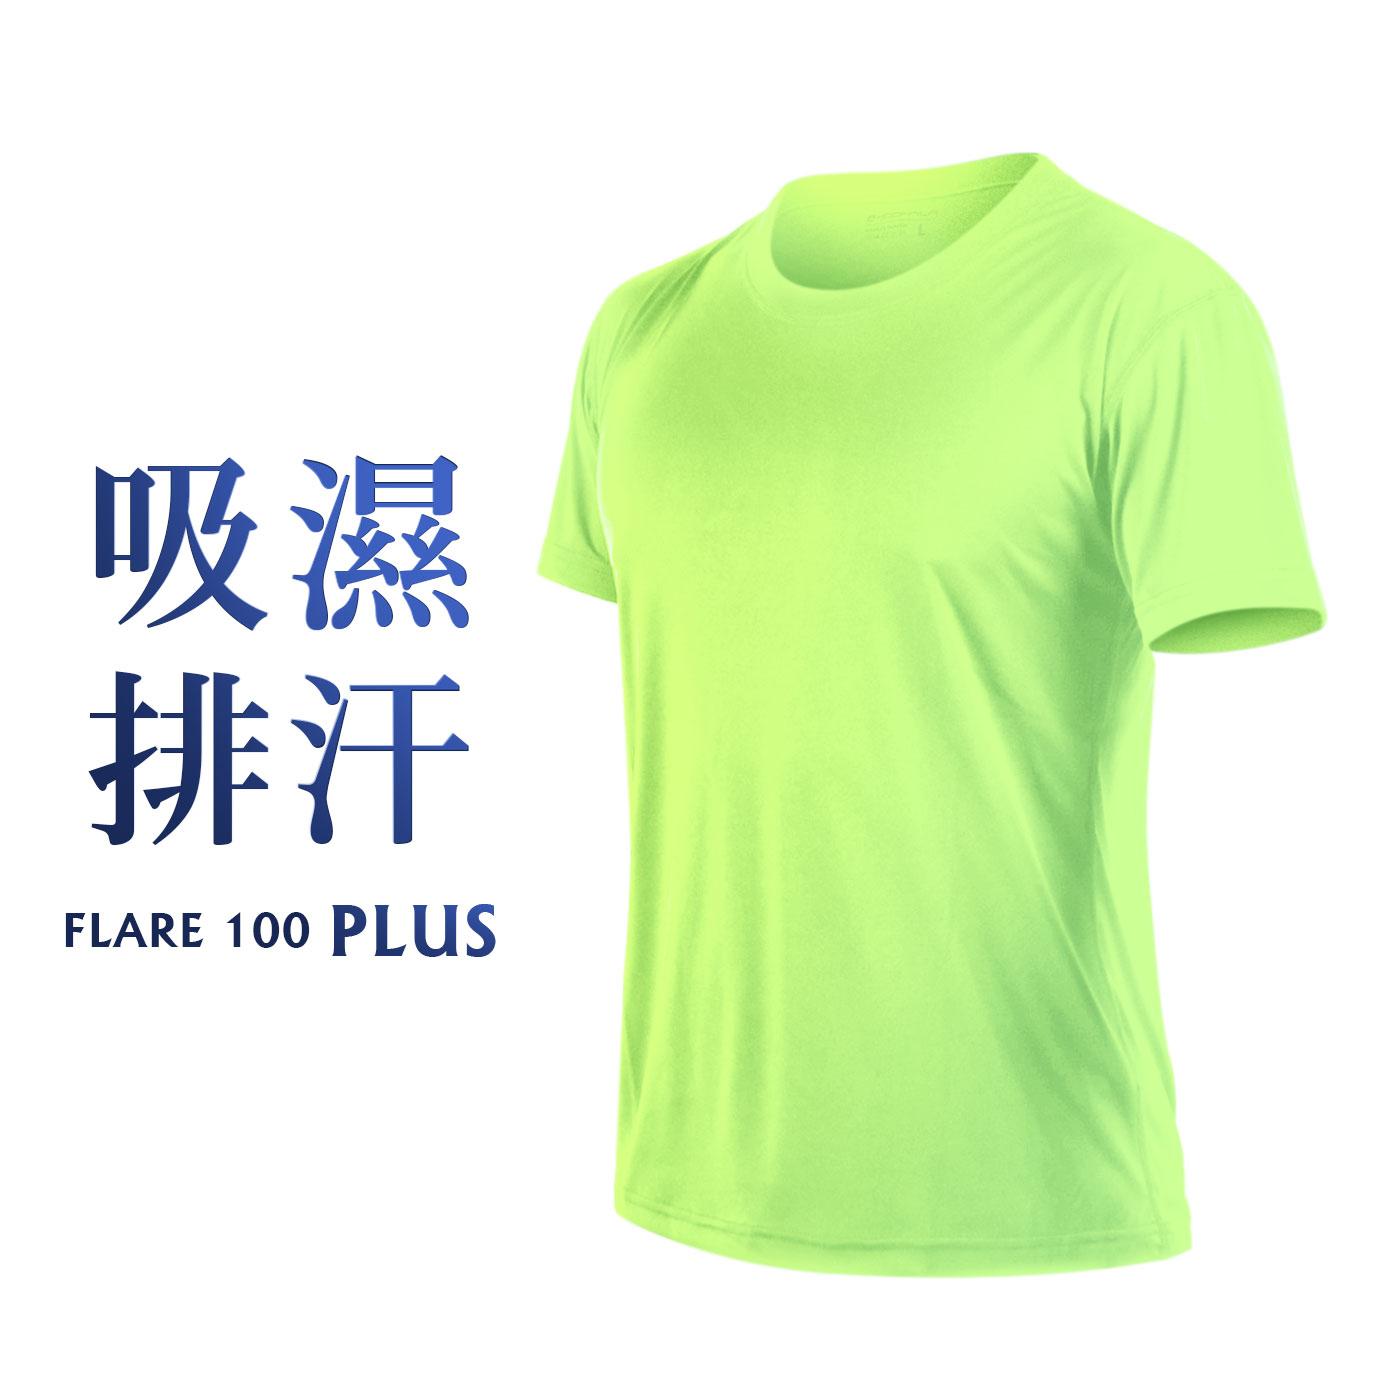 HODARLA FLARE 100 PLUS 吸濕排汗衫 3153701 - 螢光綠